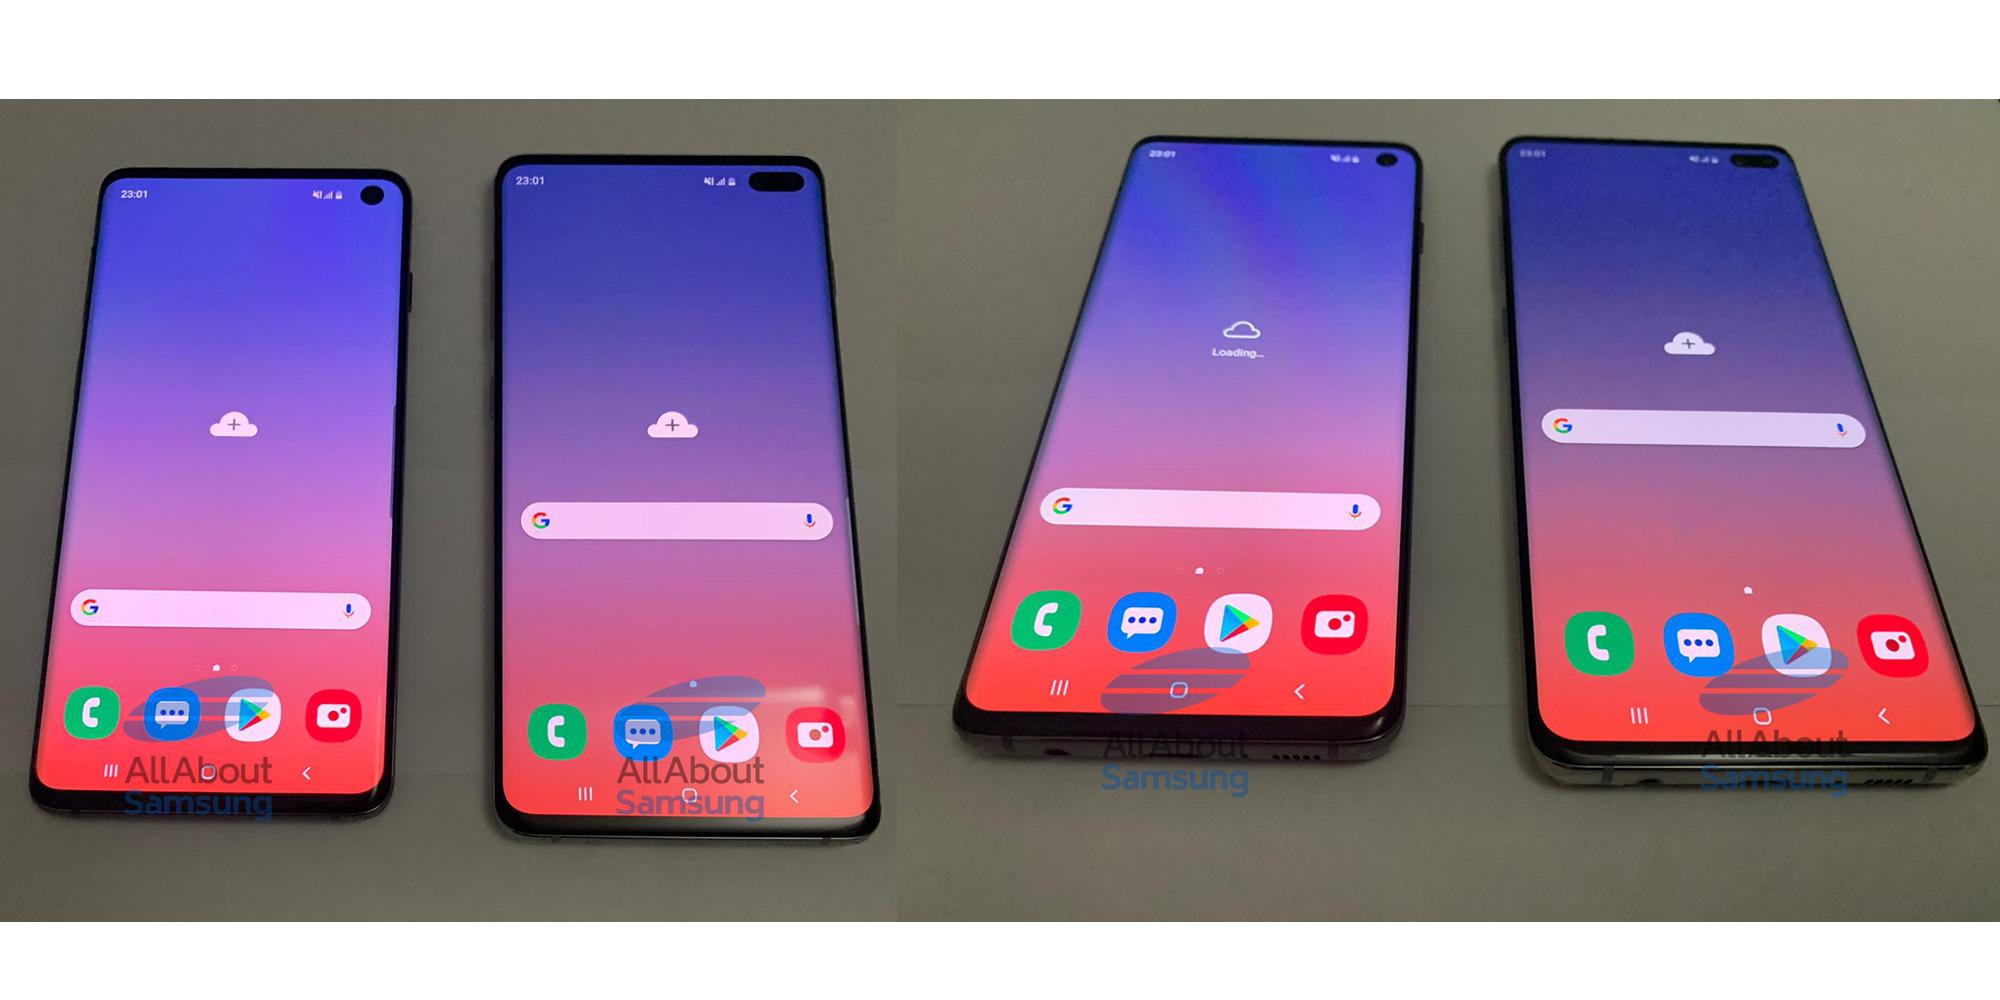 Samsung Galaxy S10 Plus Leak Pictures